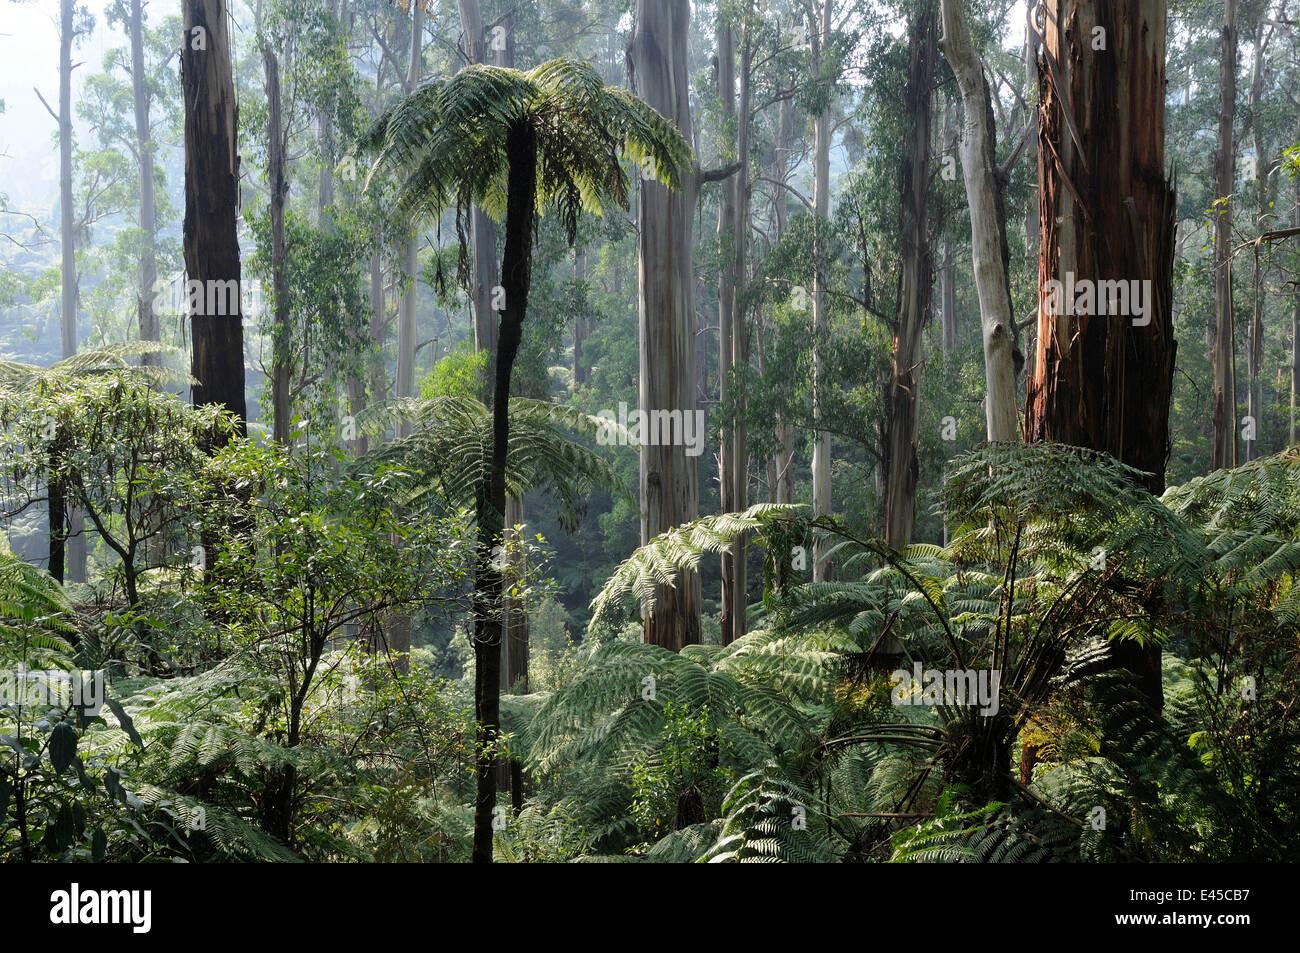 Royal eucalyptus (Eucalyptus regnans) and Soft tree-ferns (Dicksonia antarctica), Tarra Bulga National Park, Victoria, - Stock Image